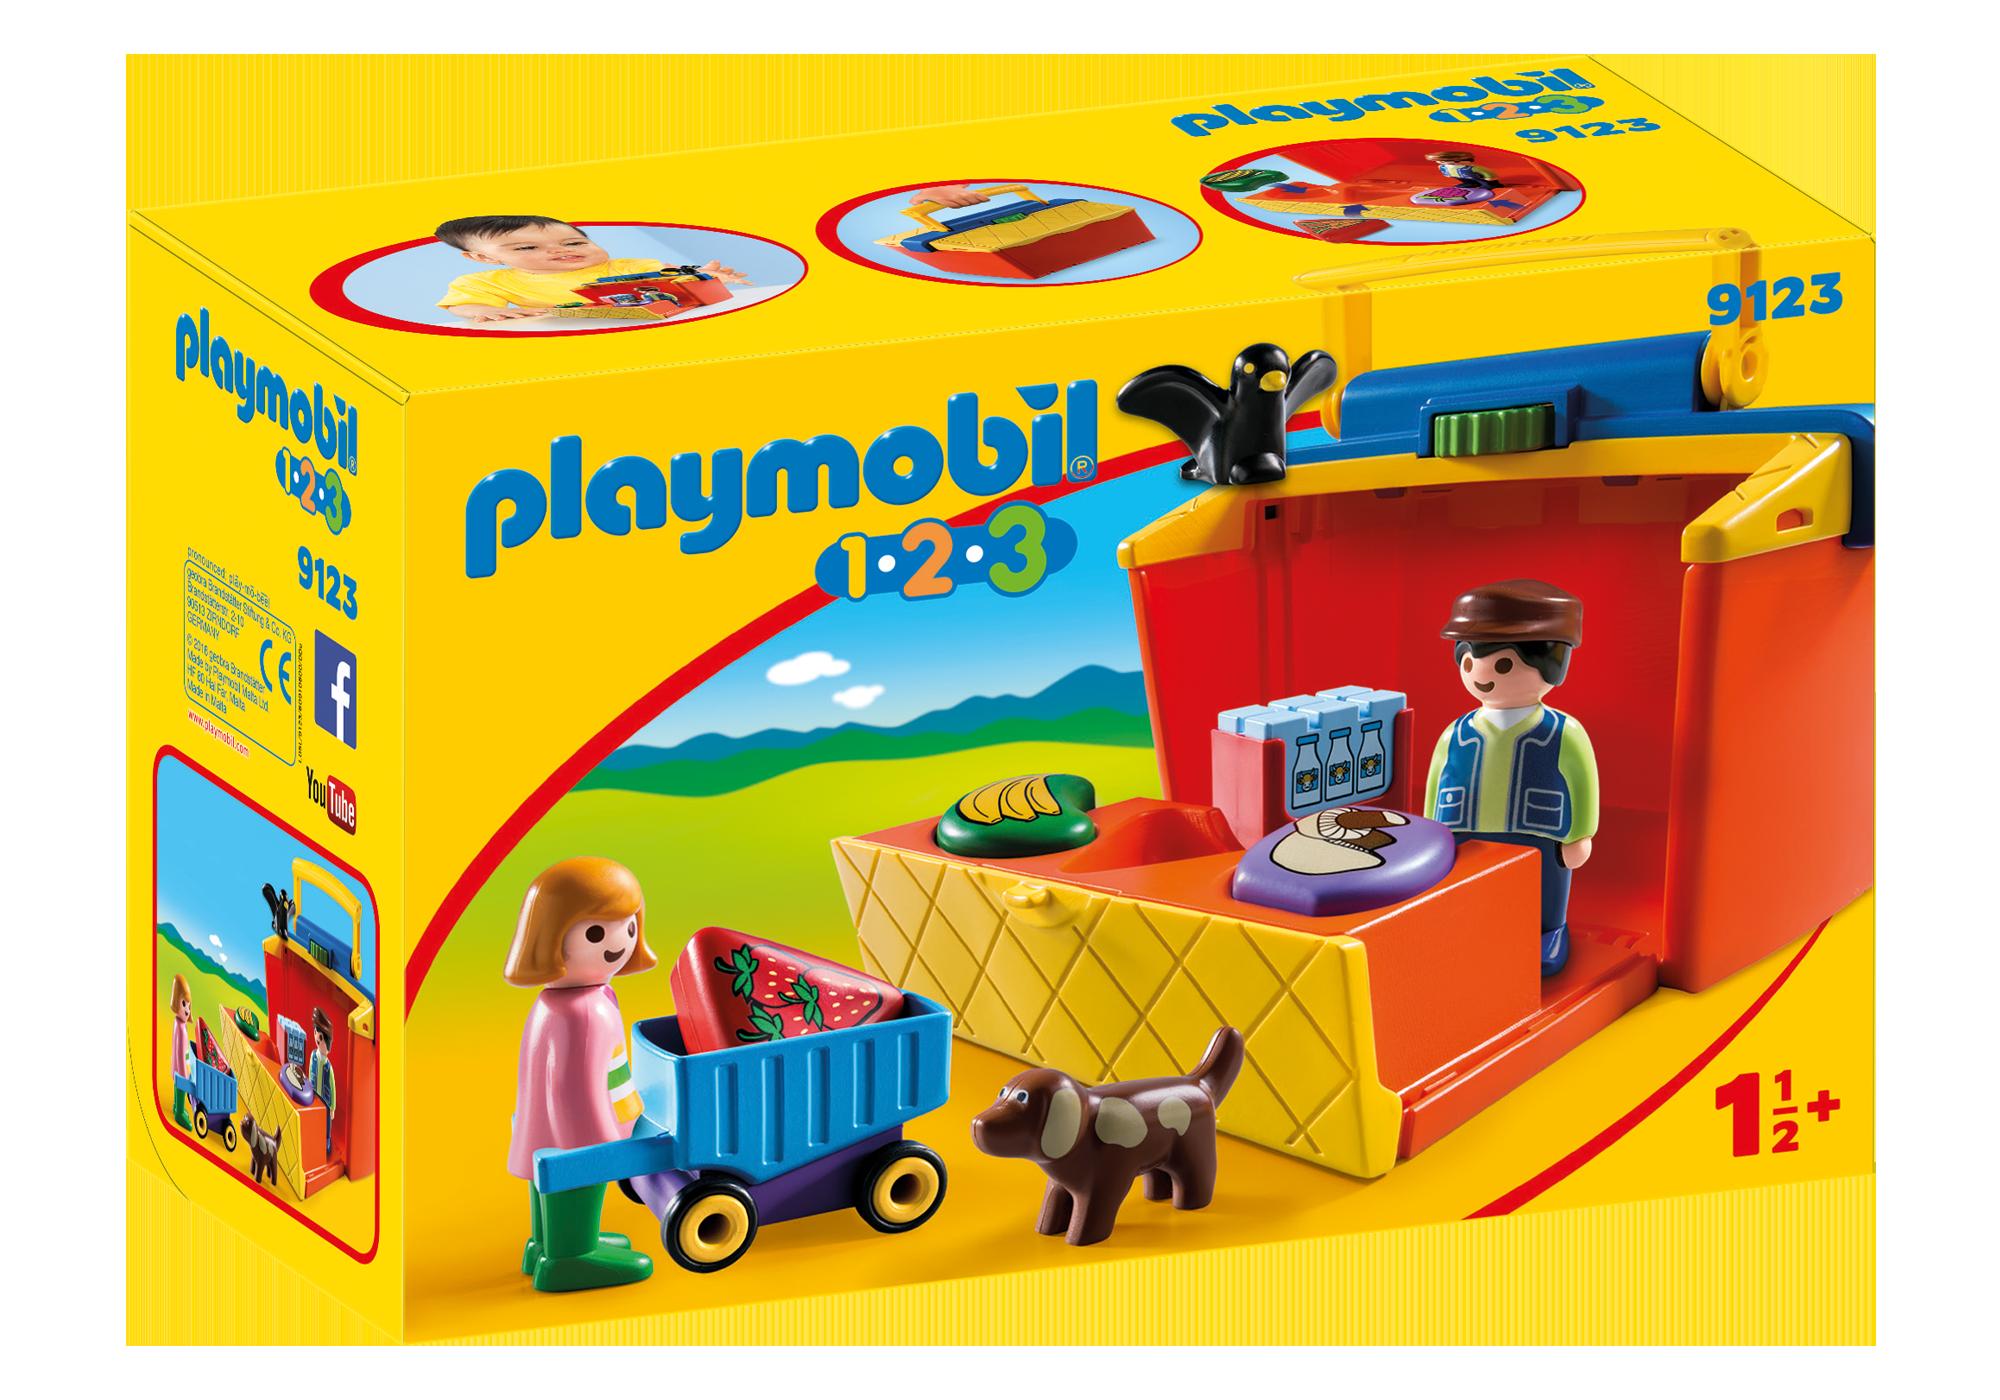 http://media.playmobil.com/i/playmobil/9123_product_box_front